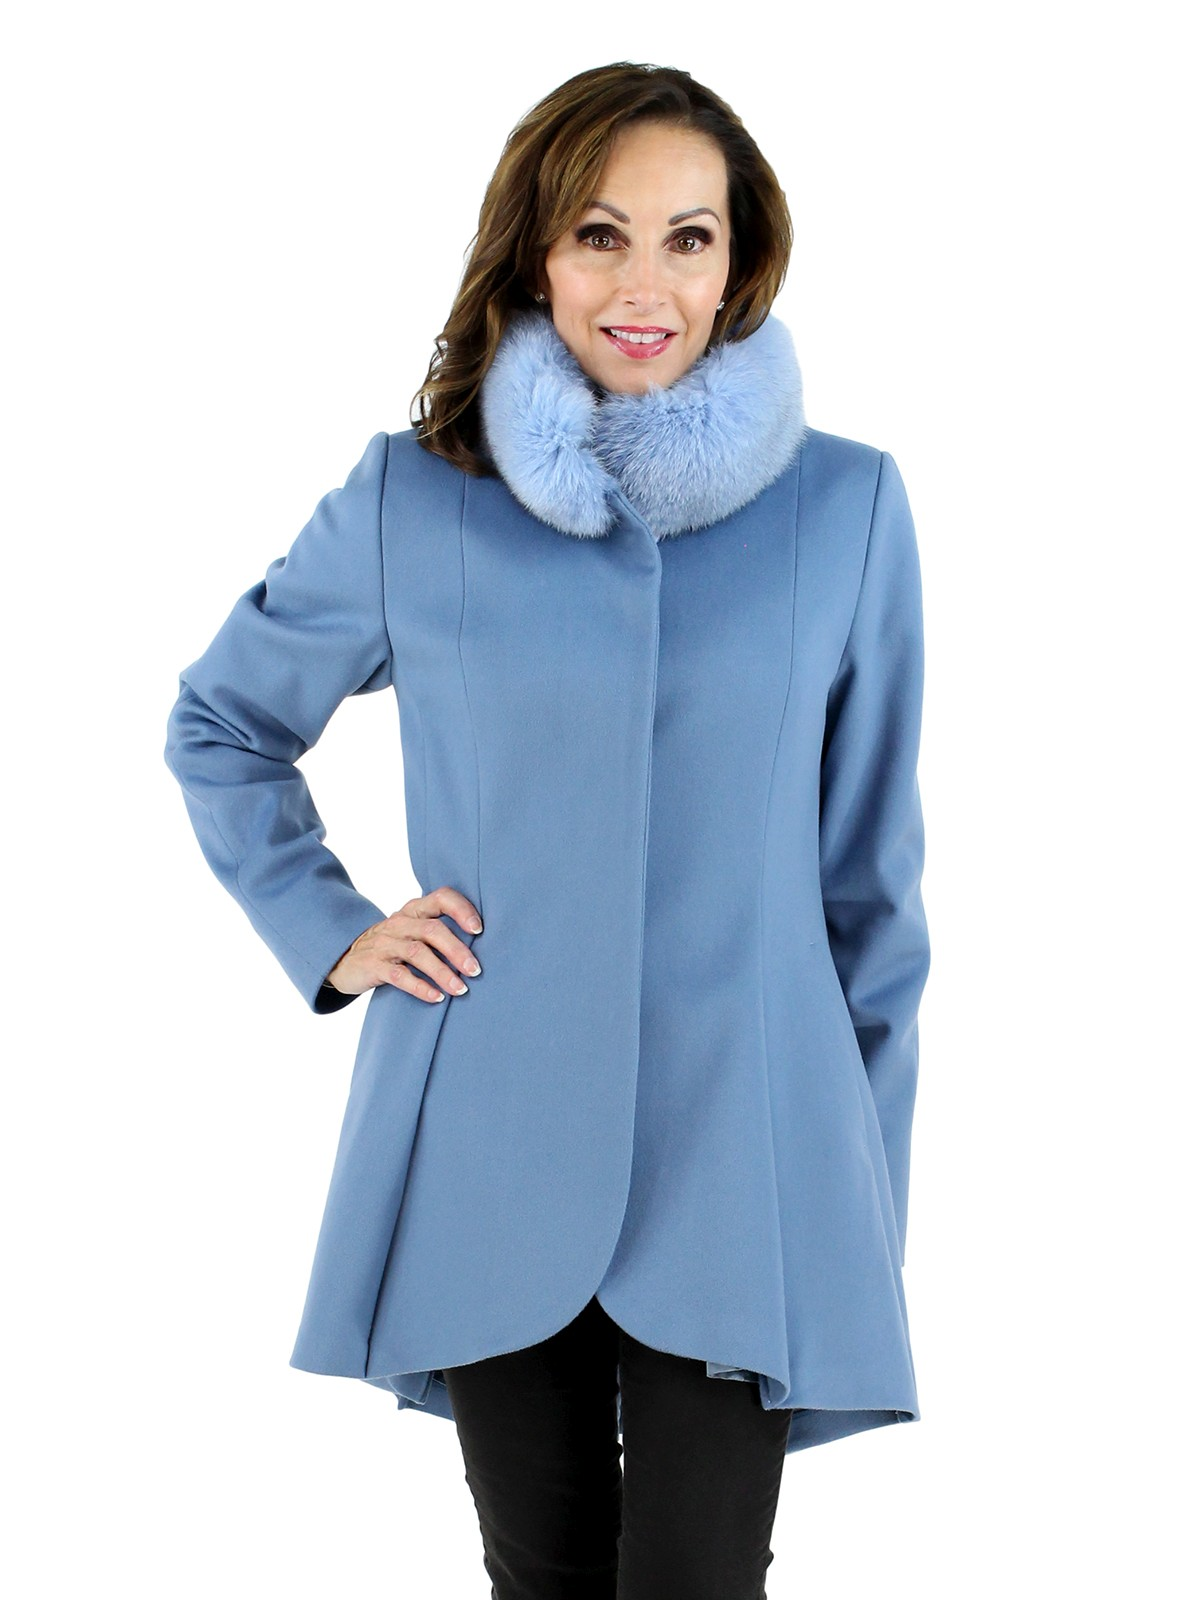 Woman's Light Blue Wool Stroller